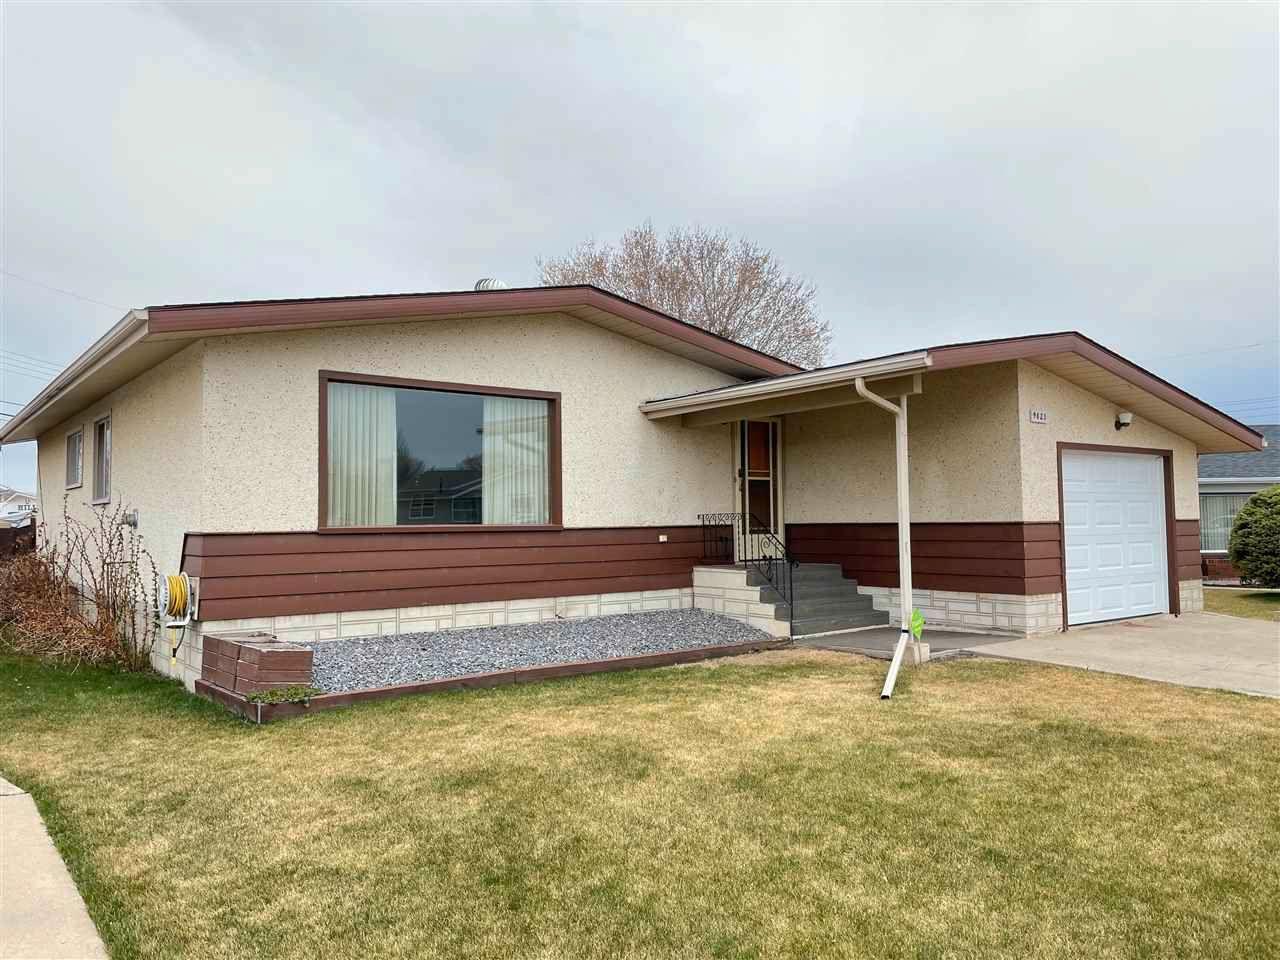 Main Photo: 9823 96 Street: Westlock House for sale : MLS®# E4242116